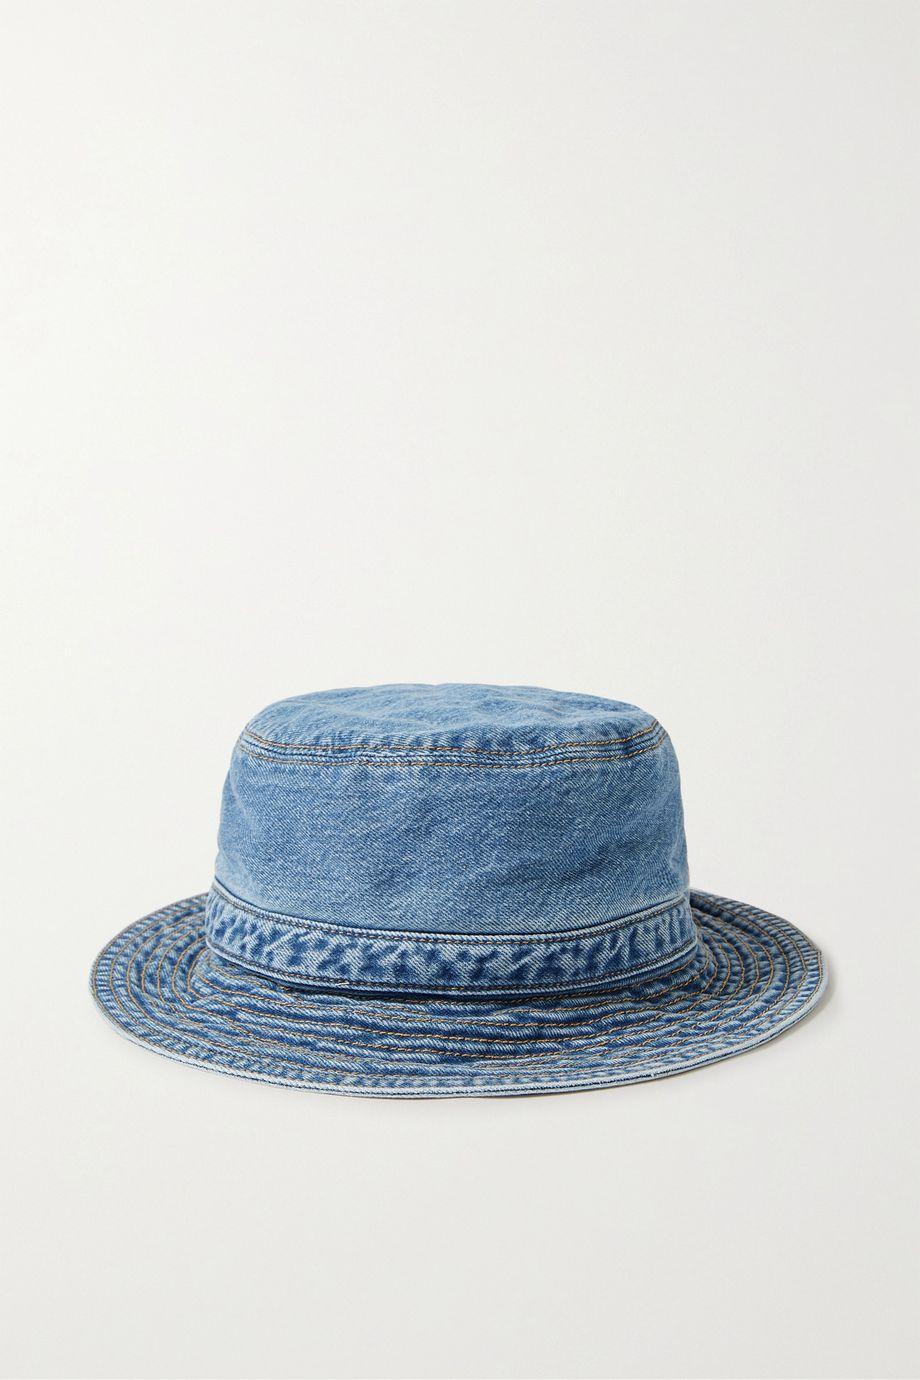 GANNI 有机牛仔布渔夫帽